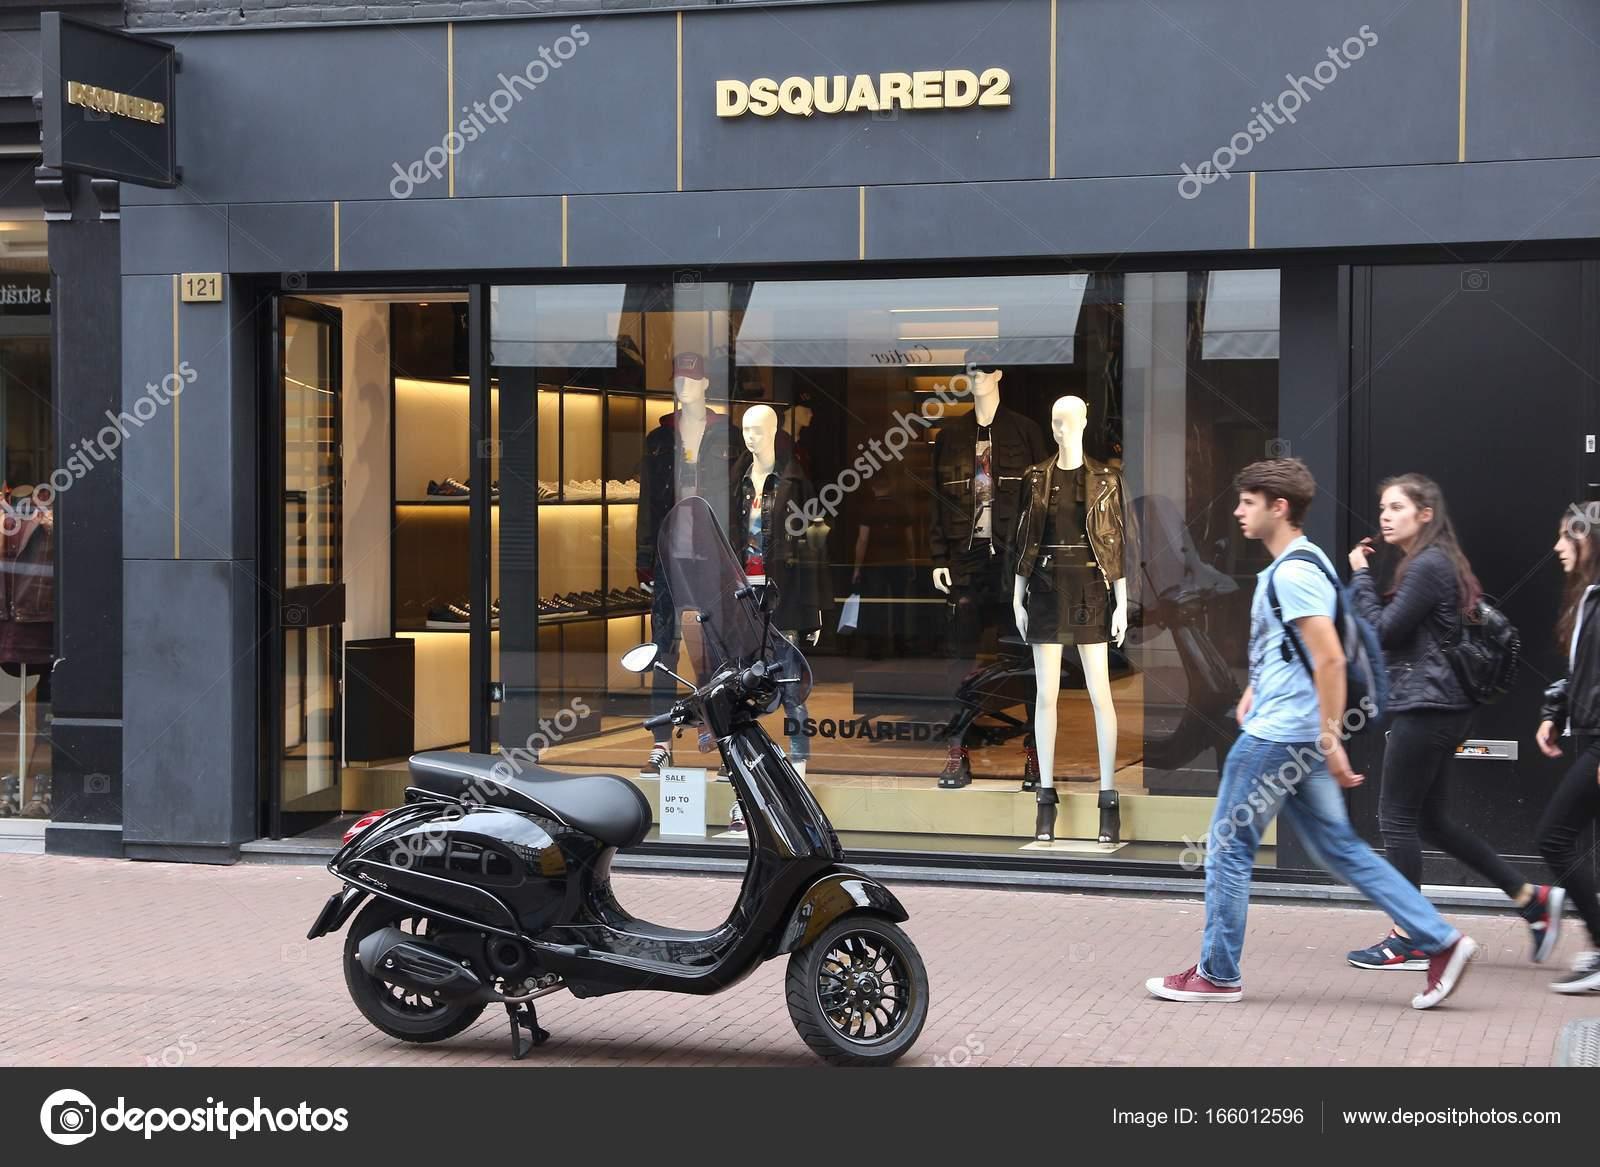 d57f529938f Dsquared2 store in Netherlands – Stock Editorial Photo © tupungato ...